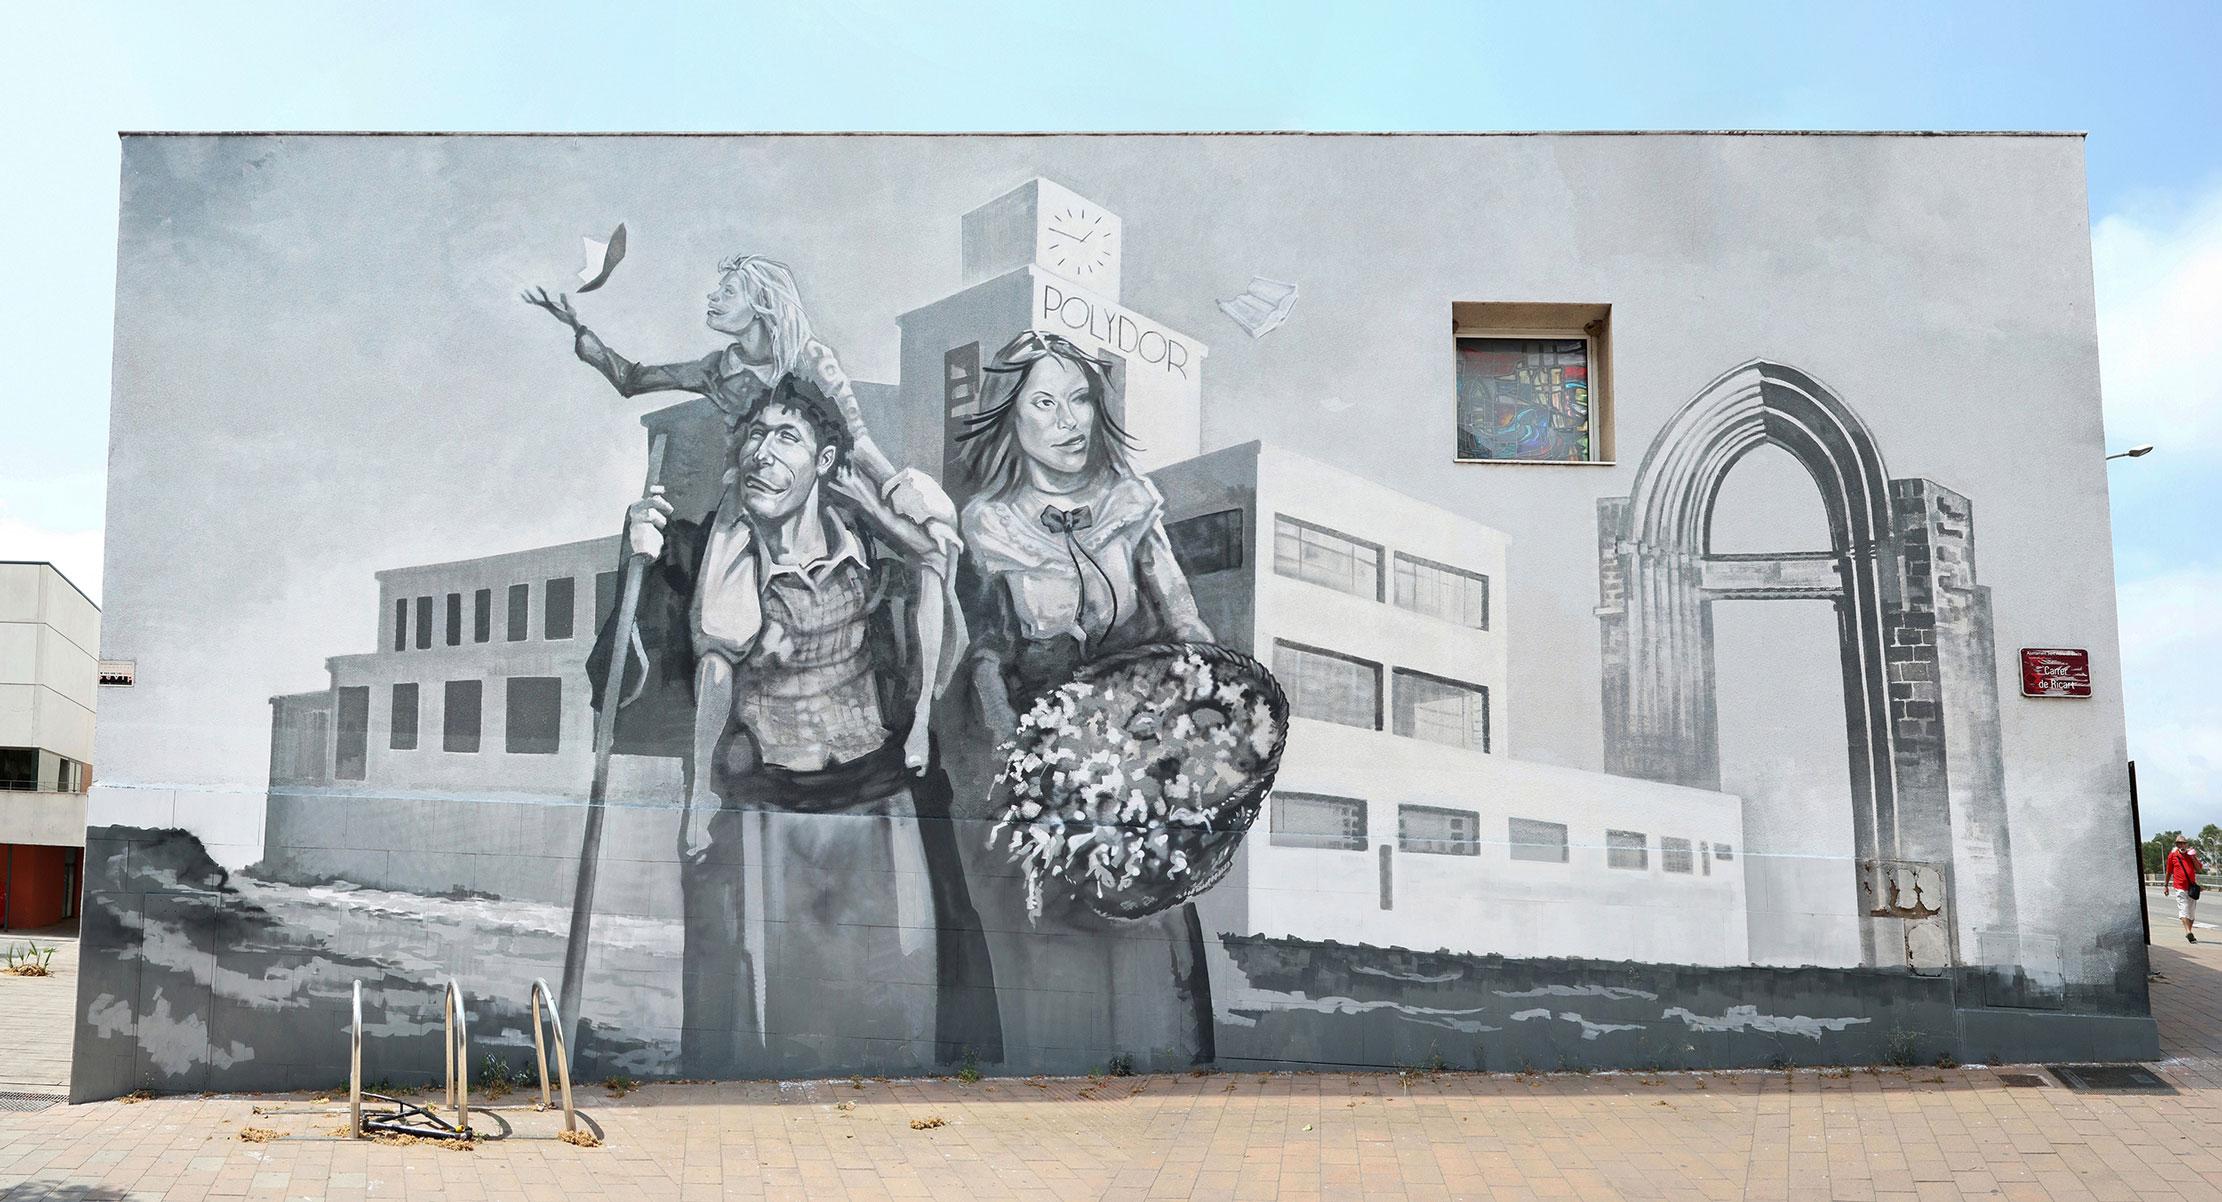 Reb.mwc en Sant Adrià de Besòs, arte urbano